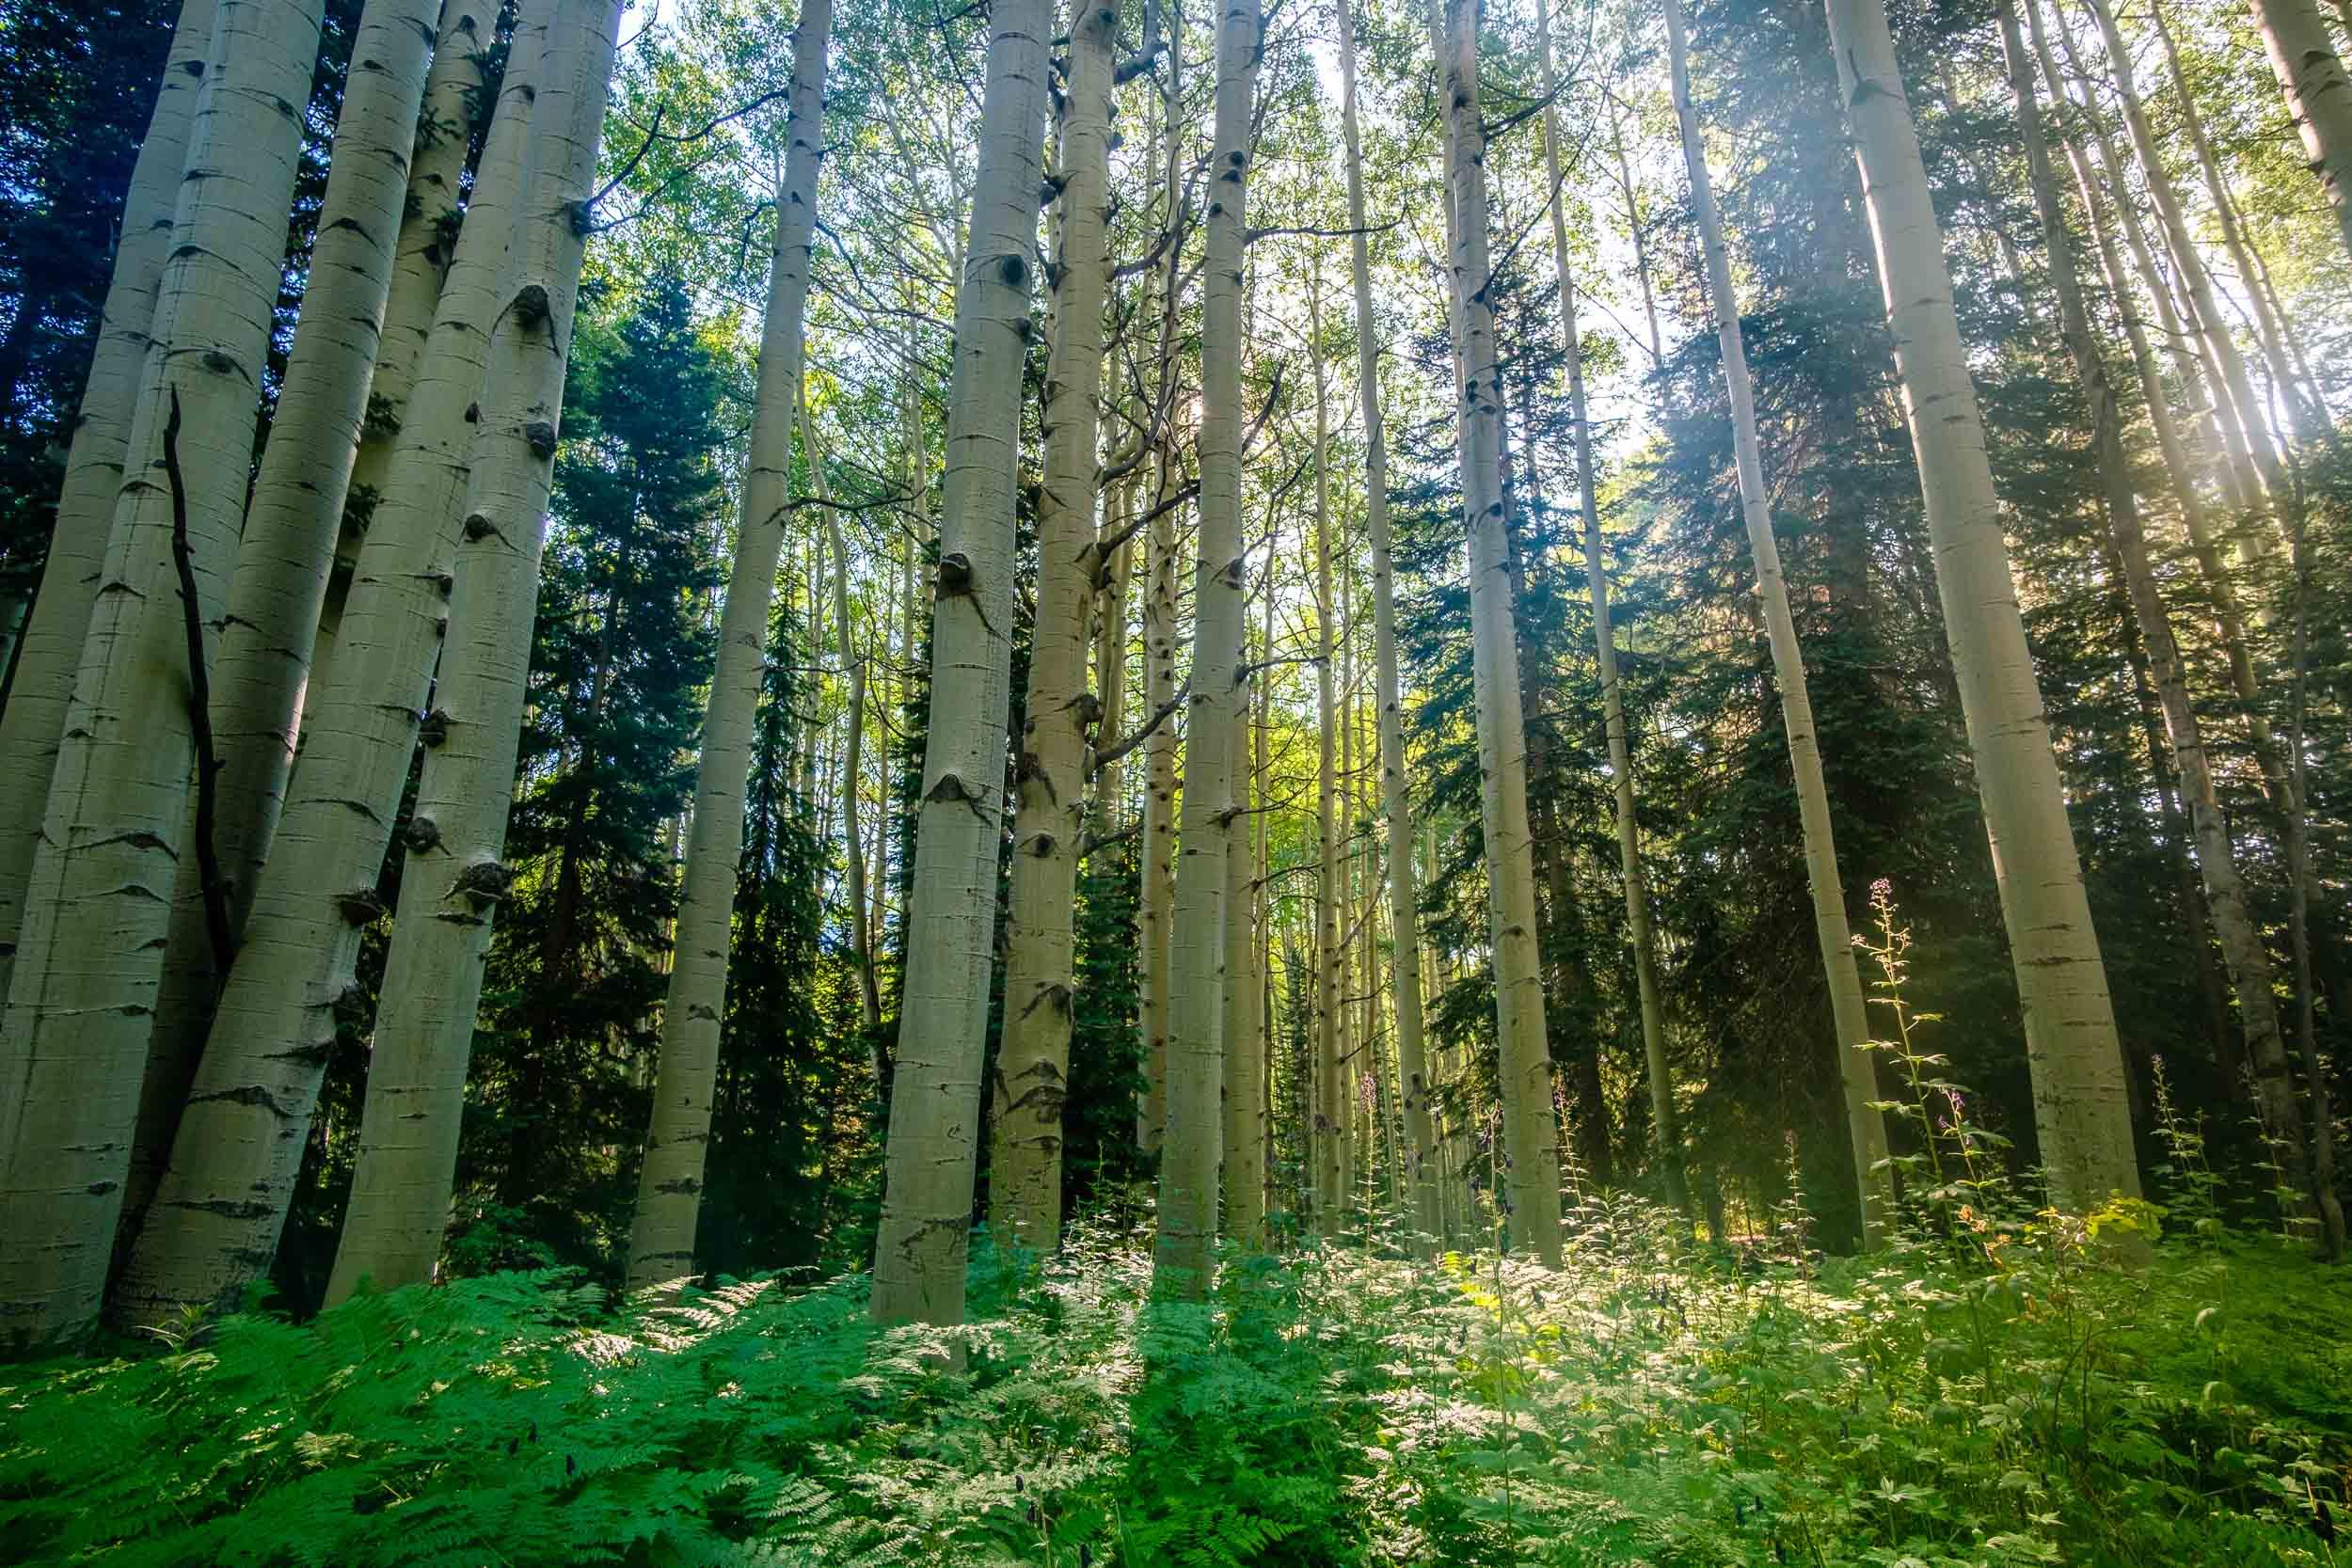 Layer of ferns along the forest floor below the aspens along Kebler Pass - Fuji XT2, Rokinon 12mm f/2